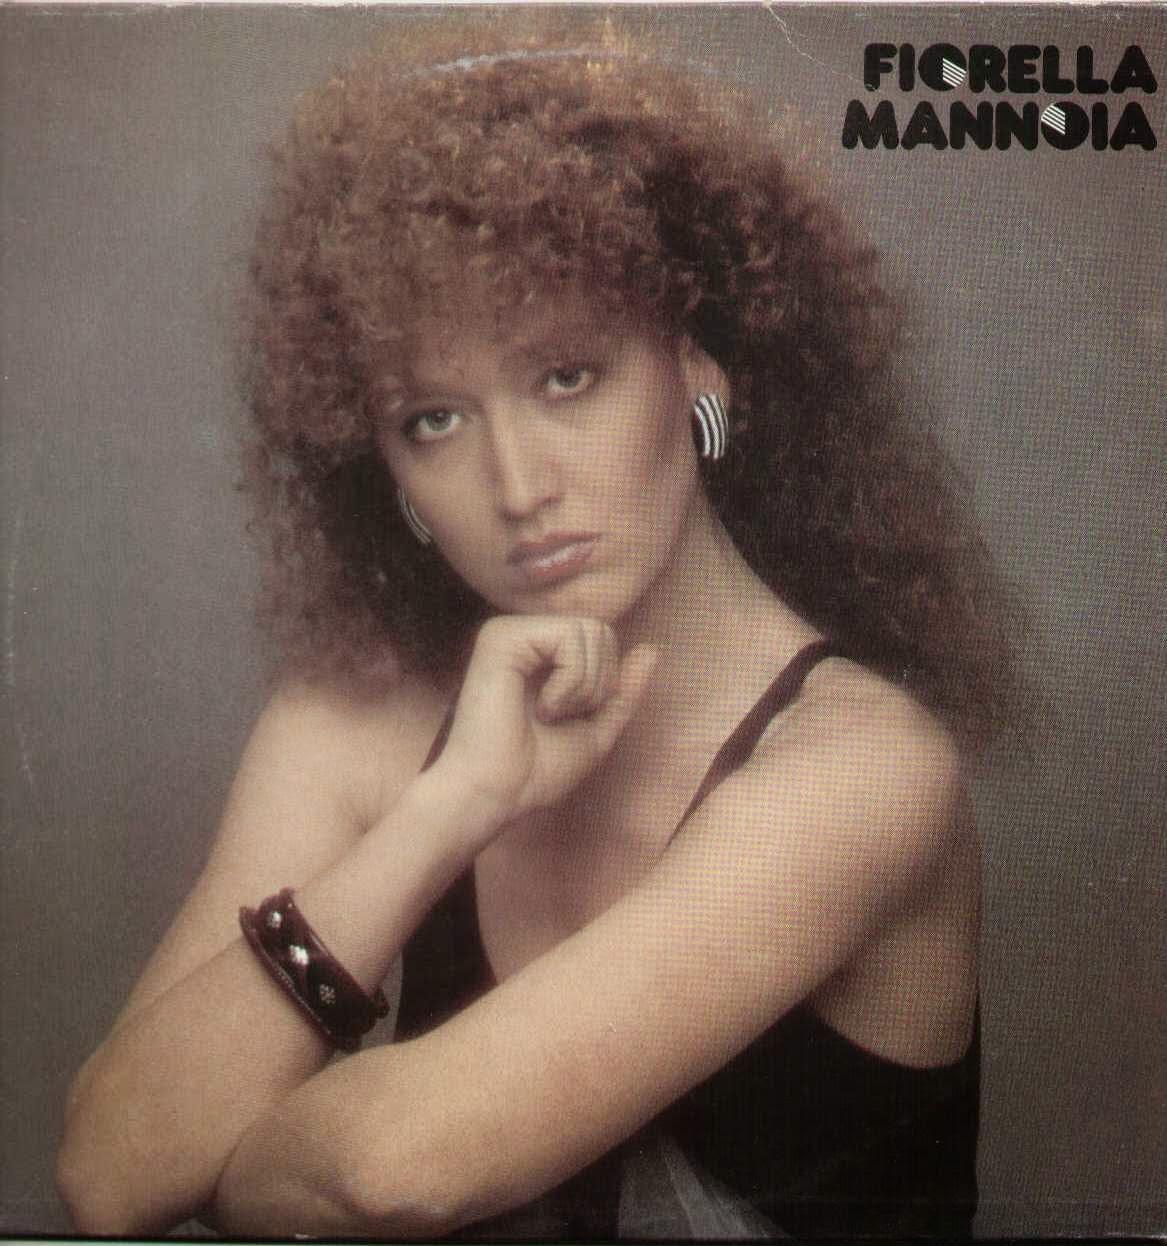 fiorella mannoia songs